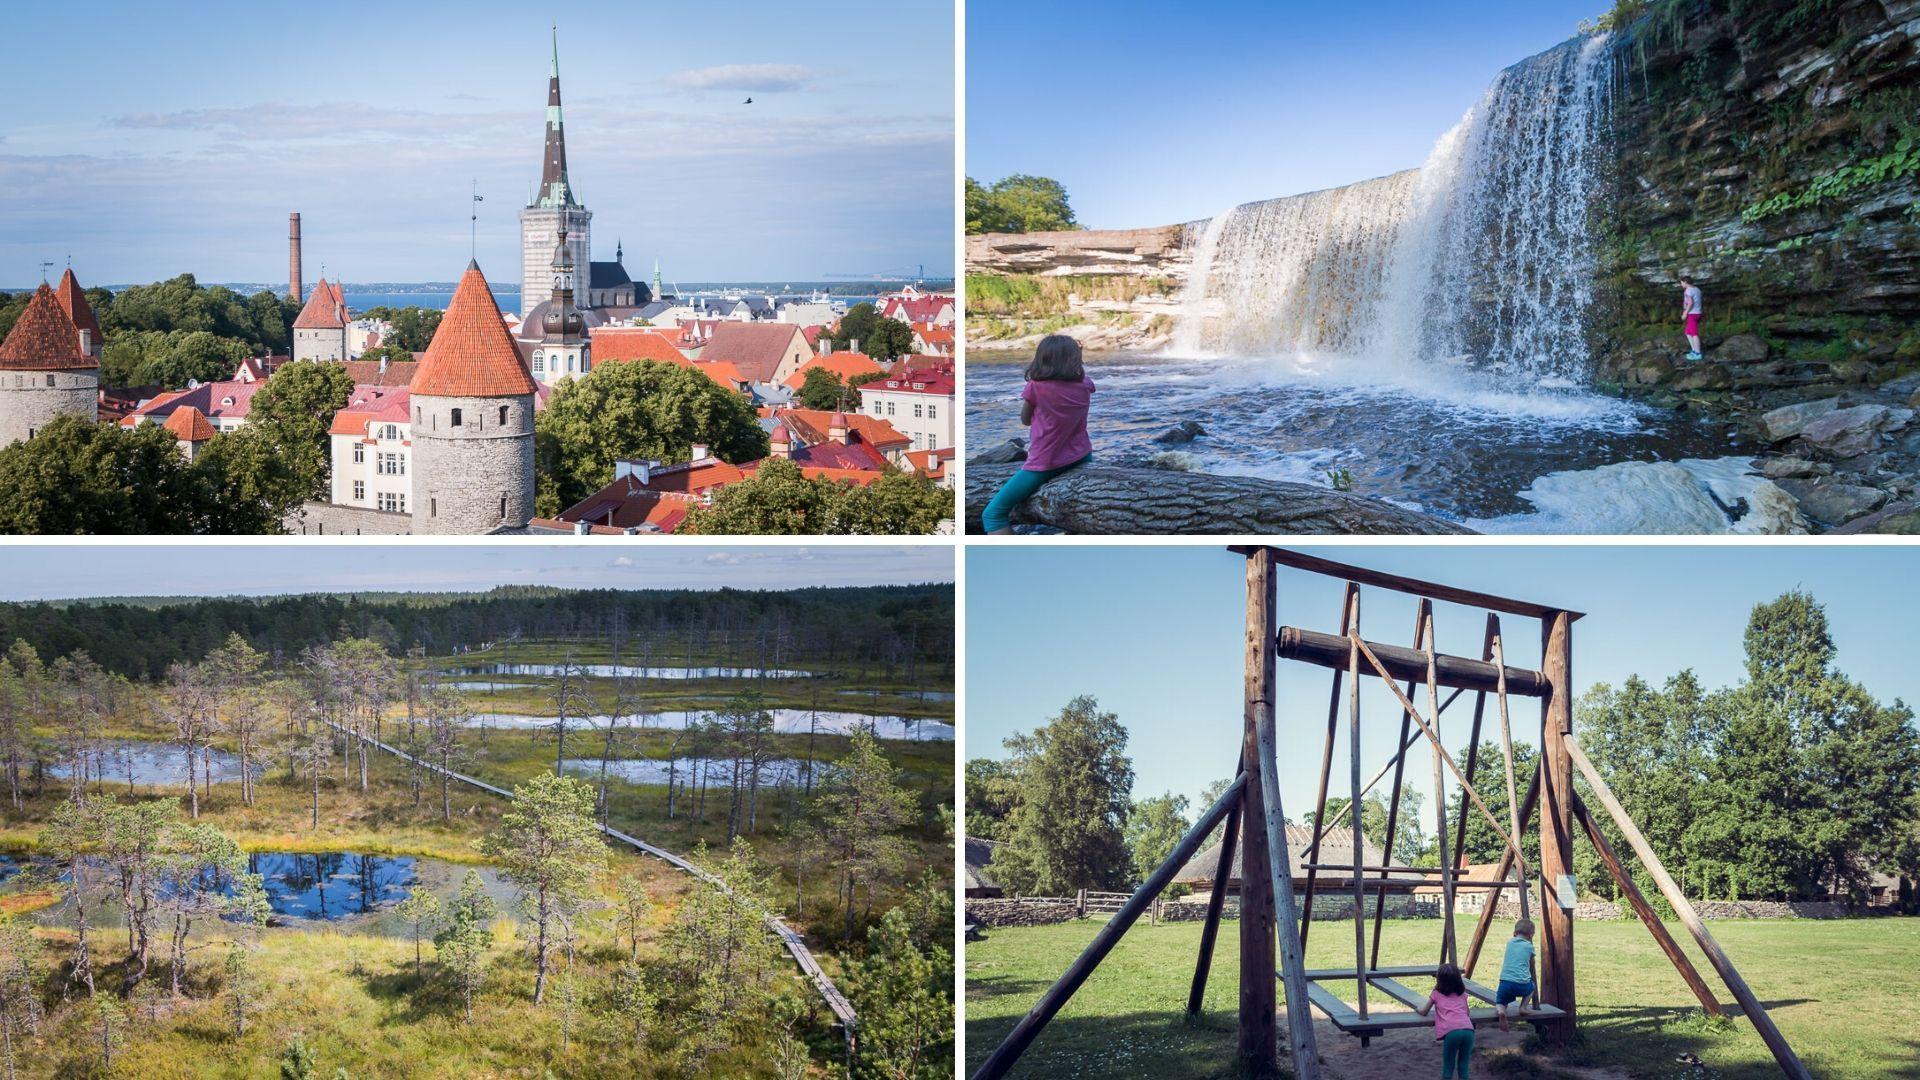 Estonia - Tallin, Tartu, Viljandi i miasteczko widmo na Litwie